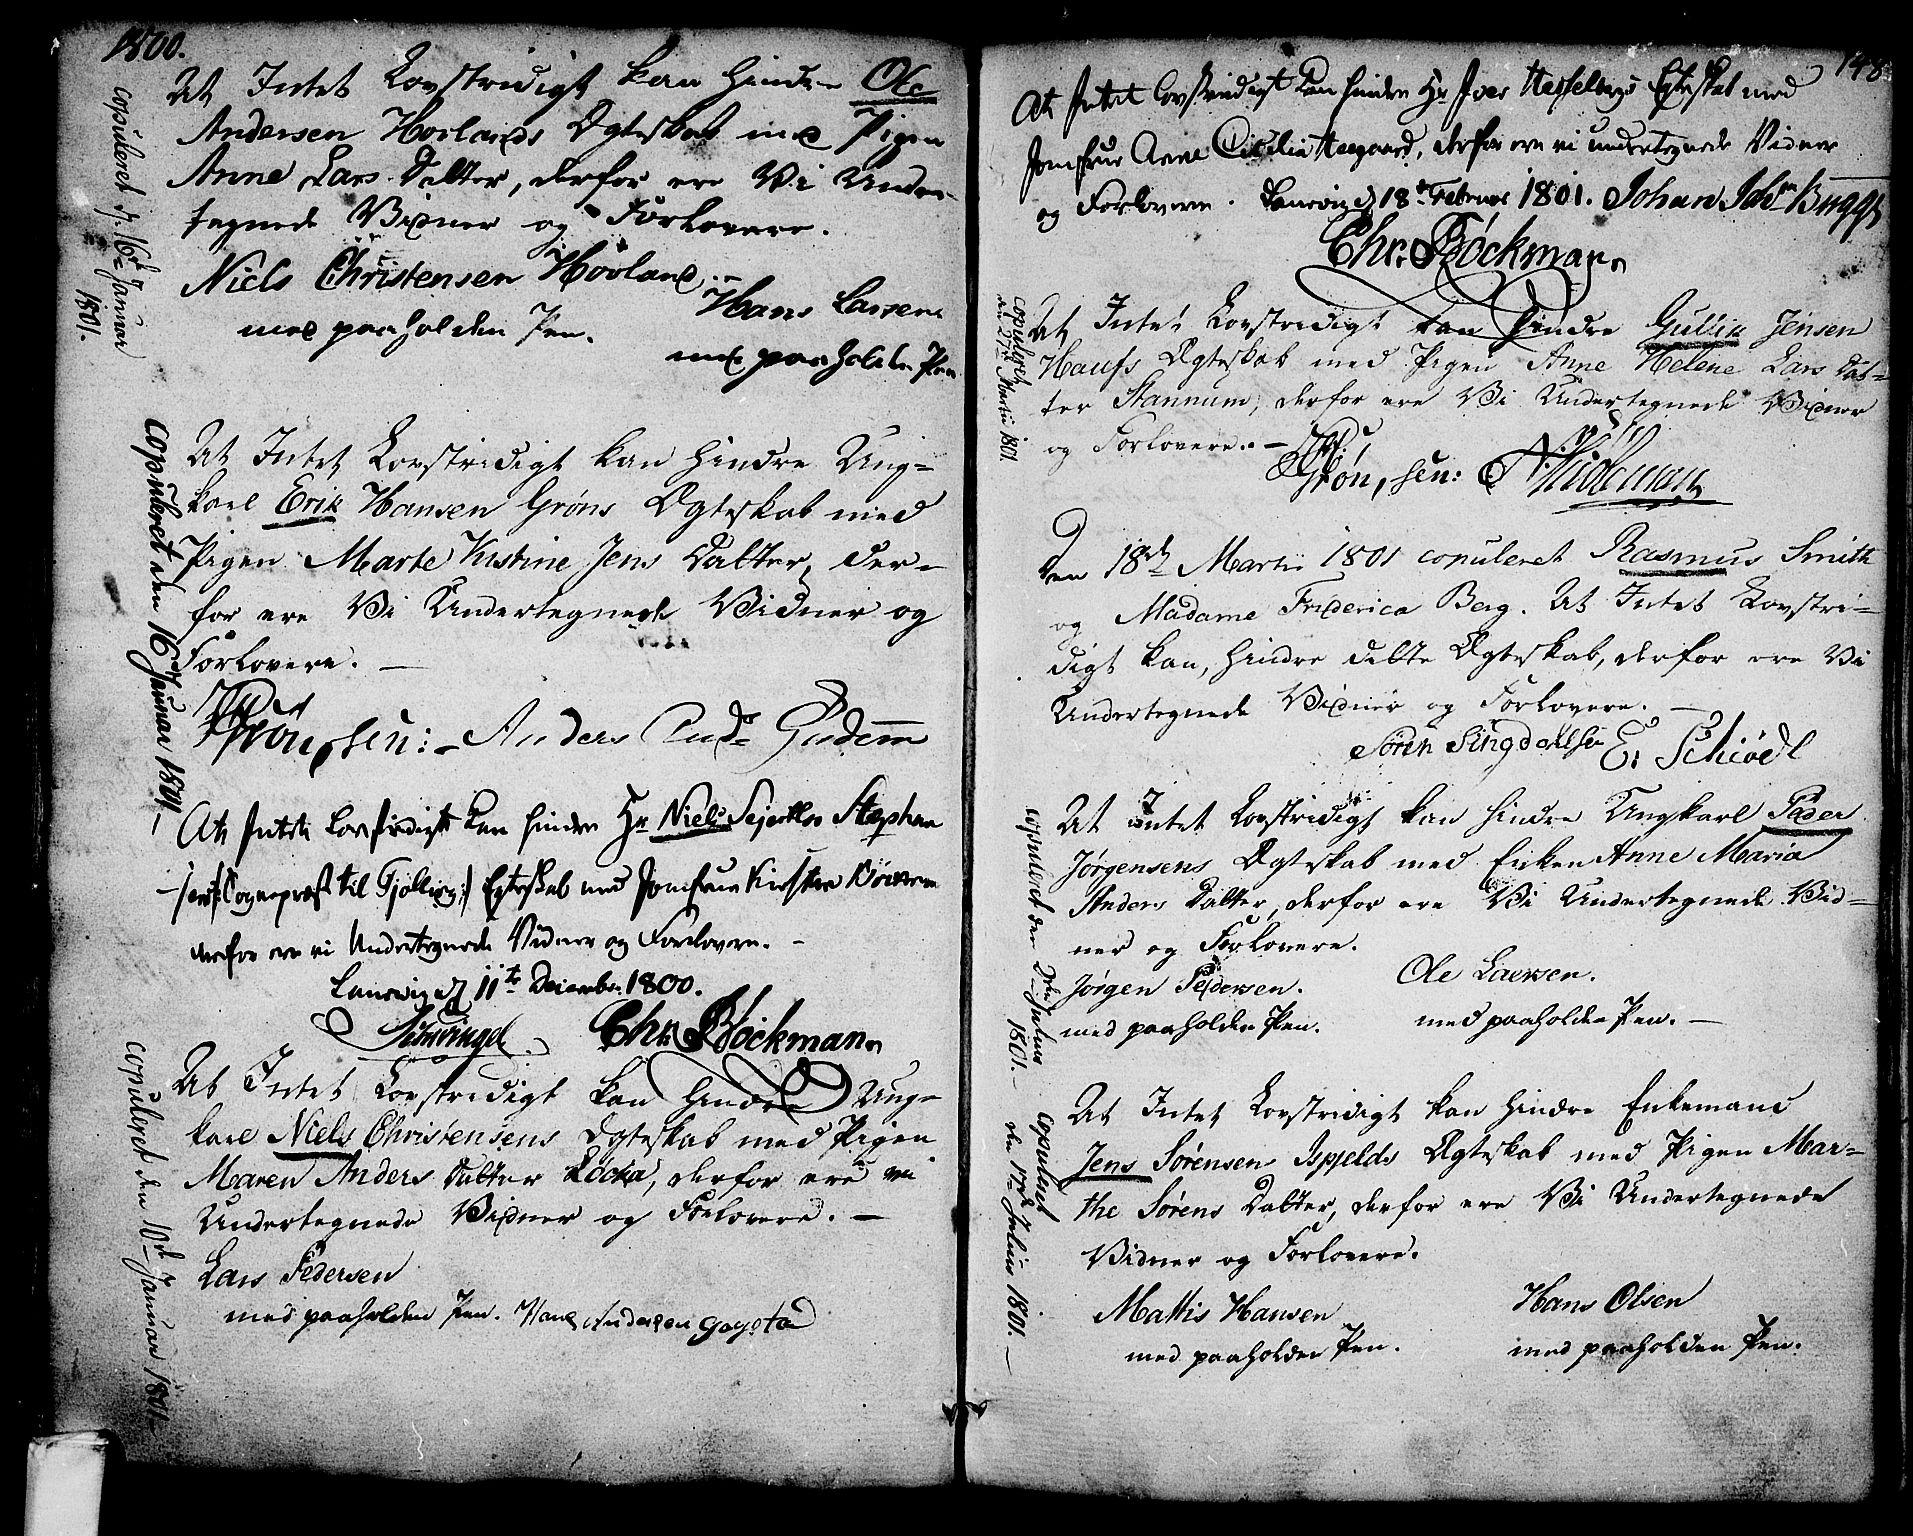 SAKO, Larvik kirkebøker, G/Ga/L0001: Klokkerbok nr. I 1, 1785-1807, s. 148